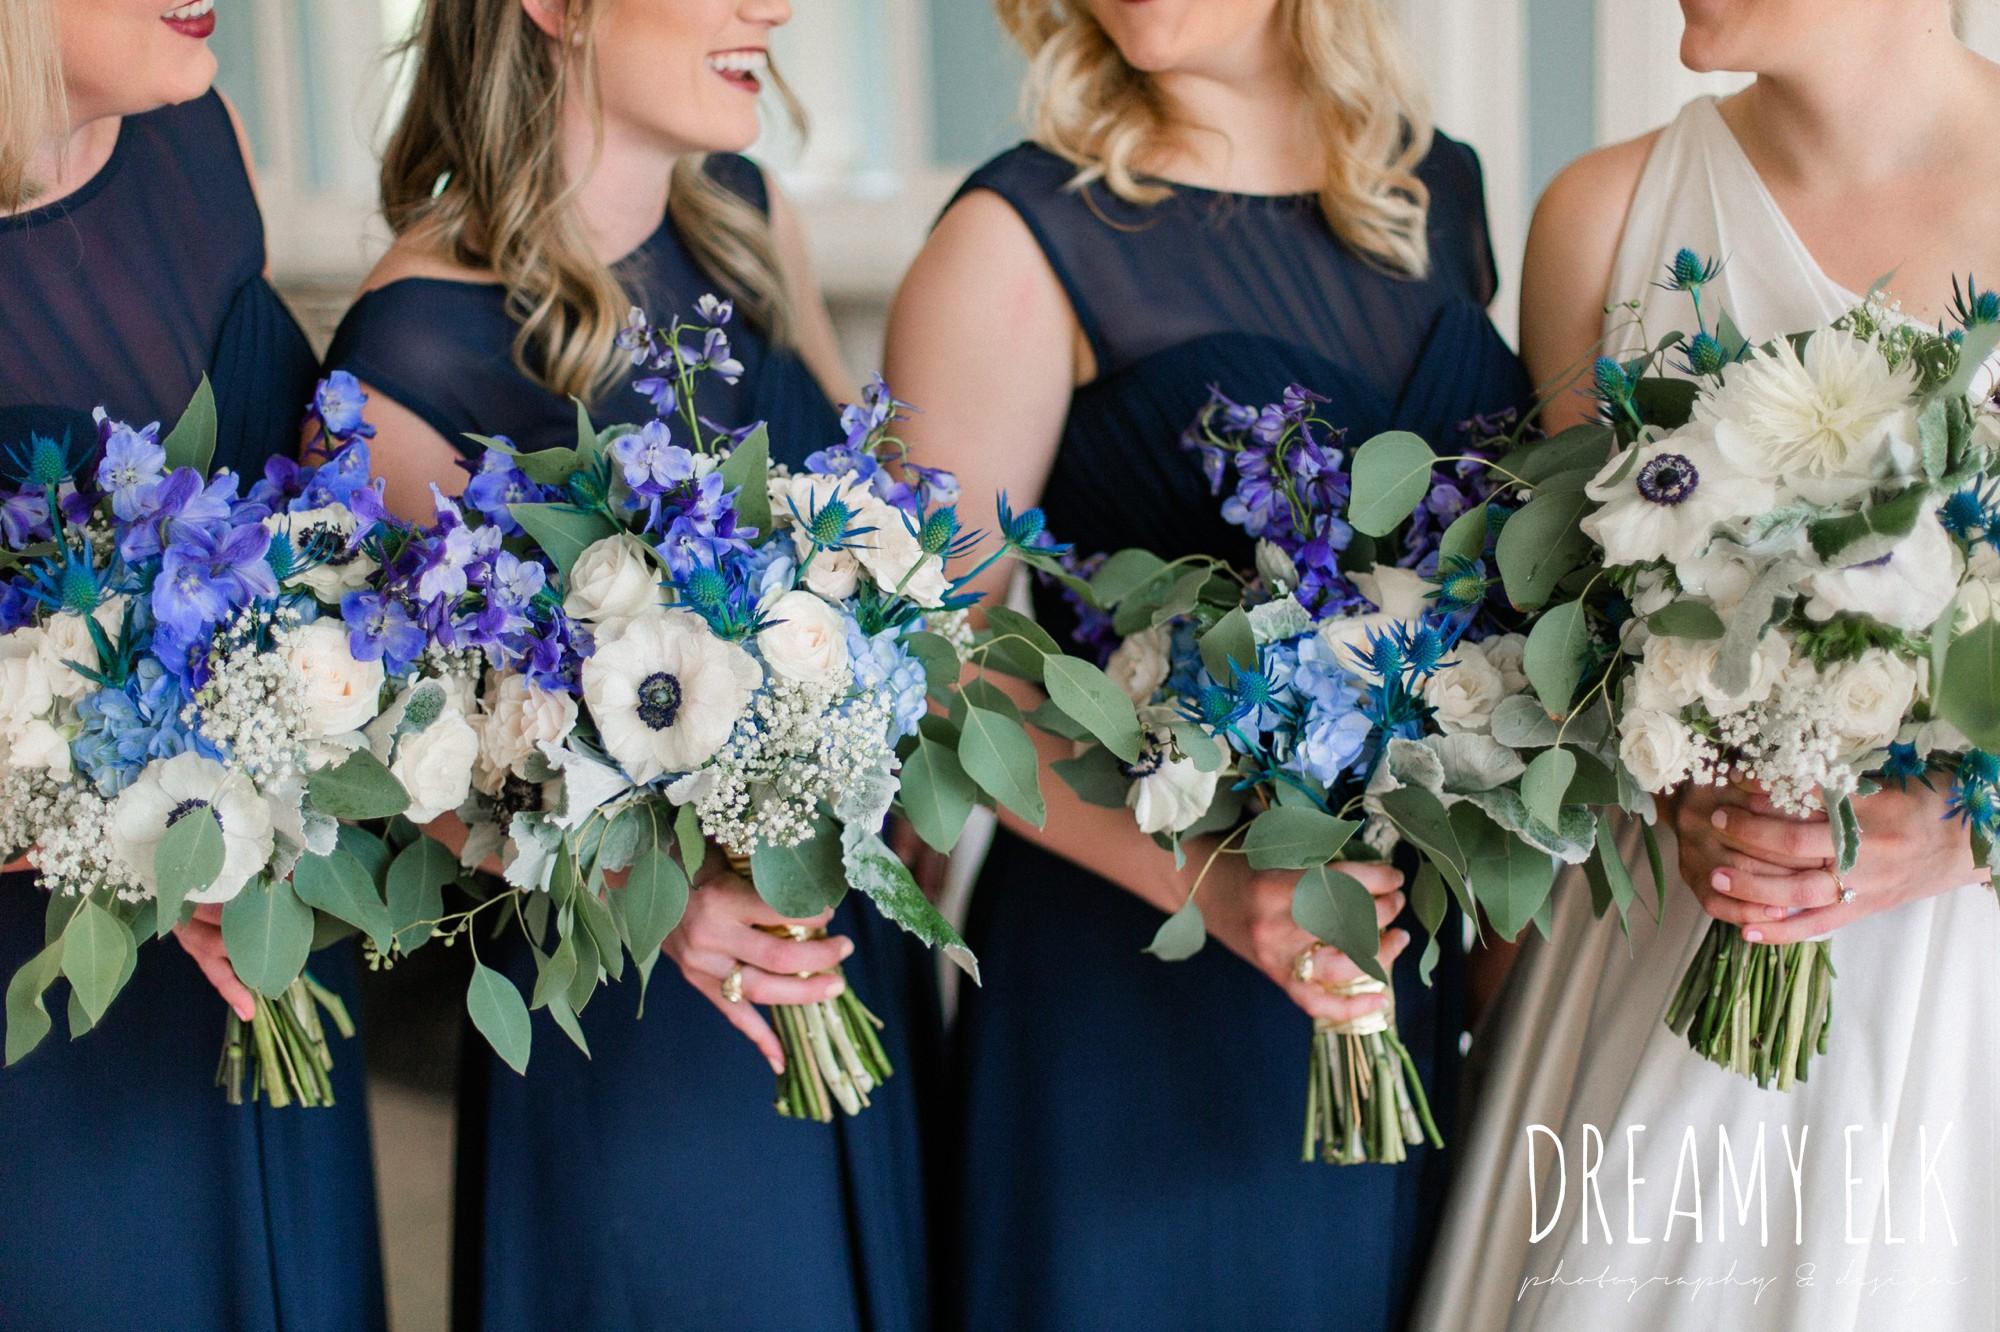 carriage house floral design, blue wedding bouquet, navy bridesmaid dress, spring wedding, the astin mansion, bryan, texas, spring wedding, dreamy elk photography and design